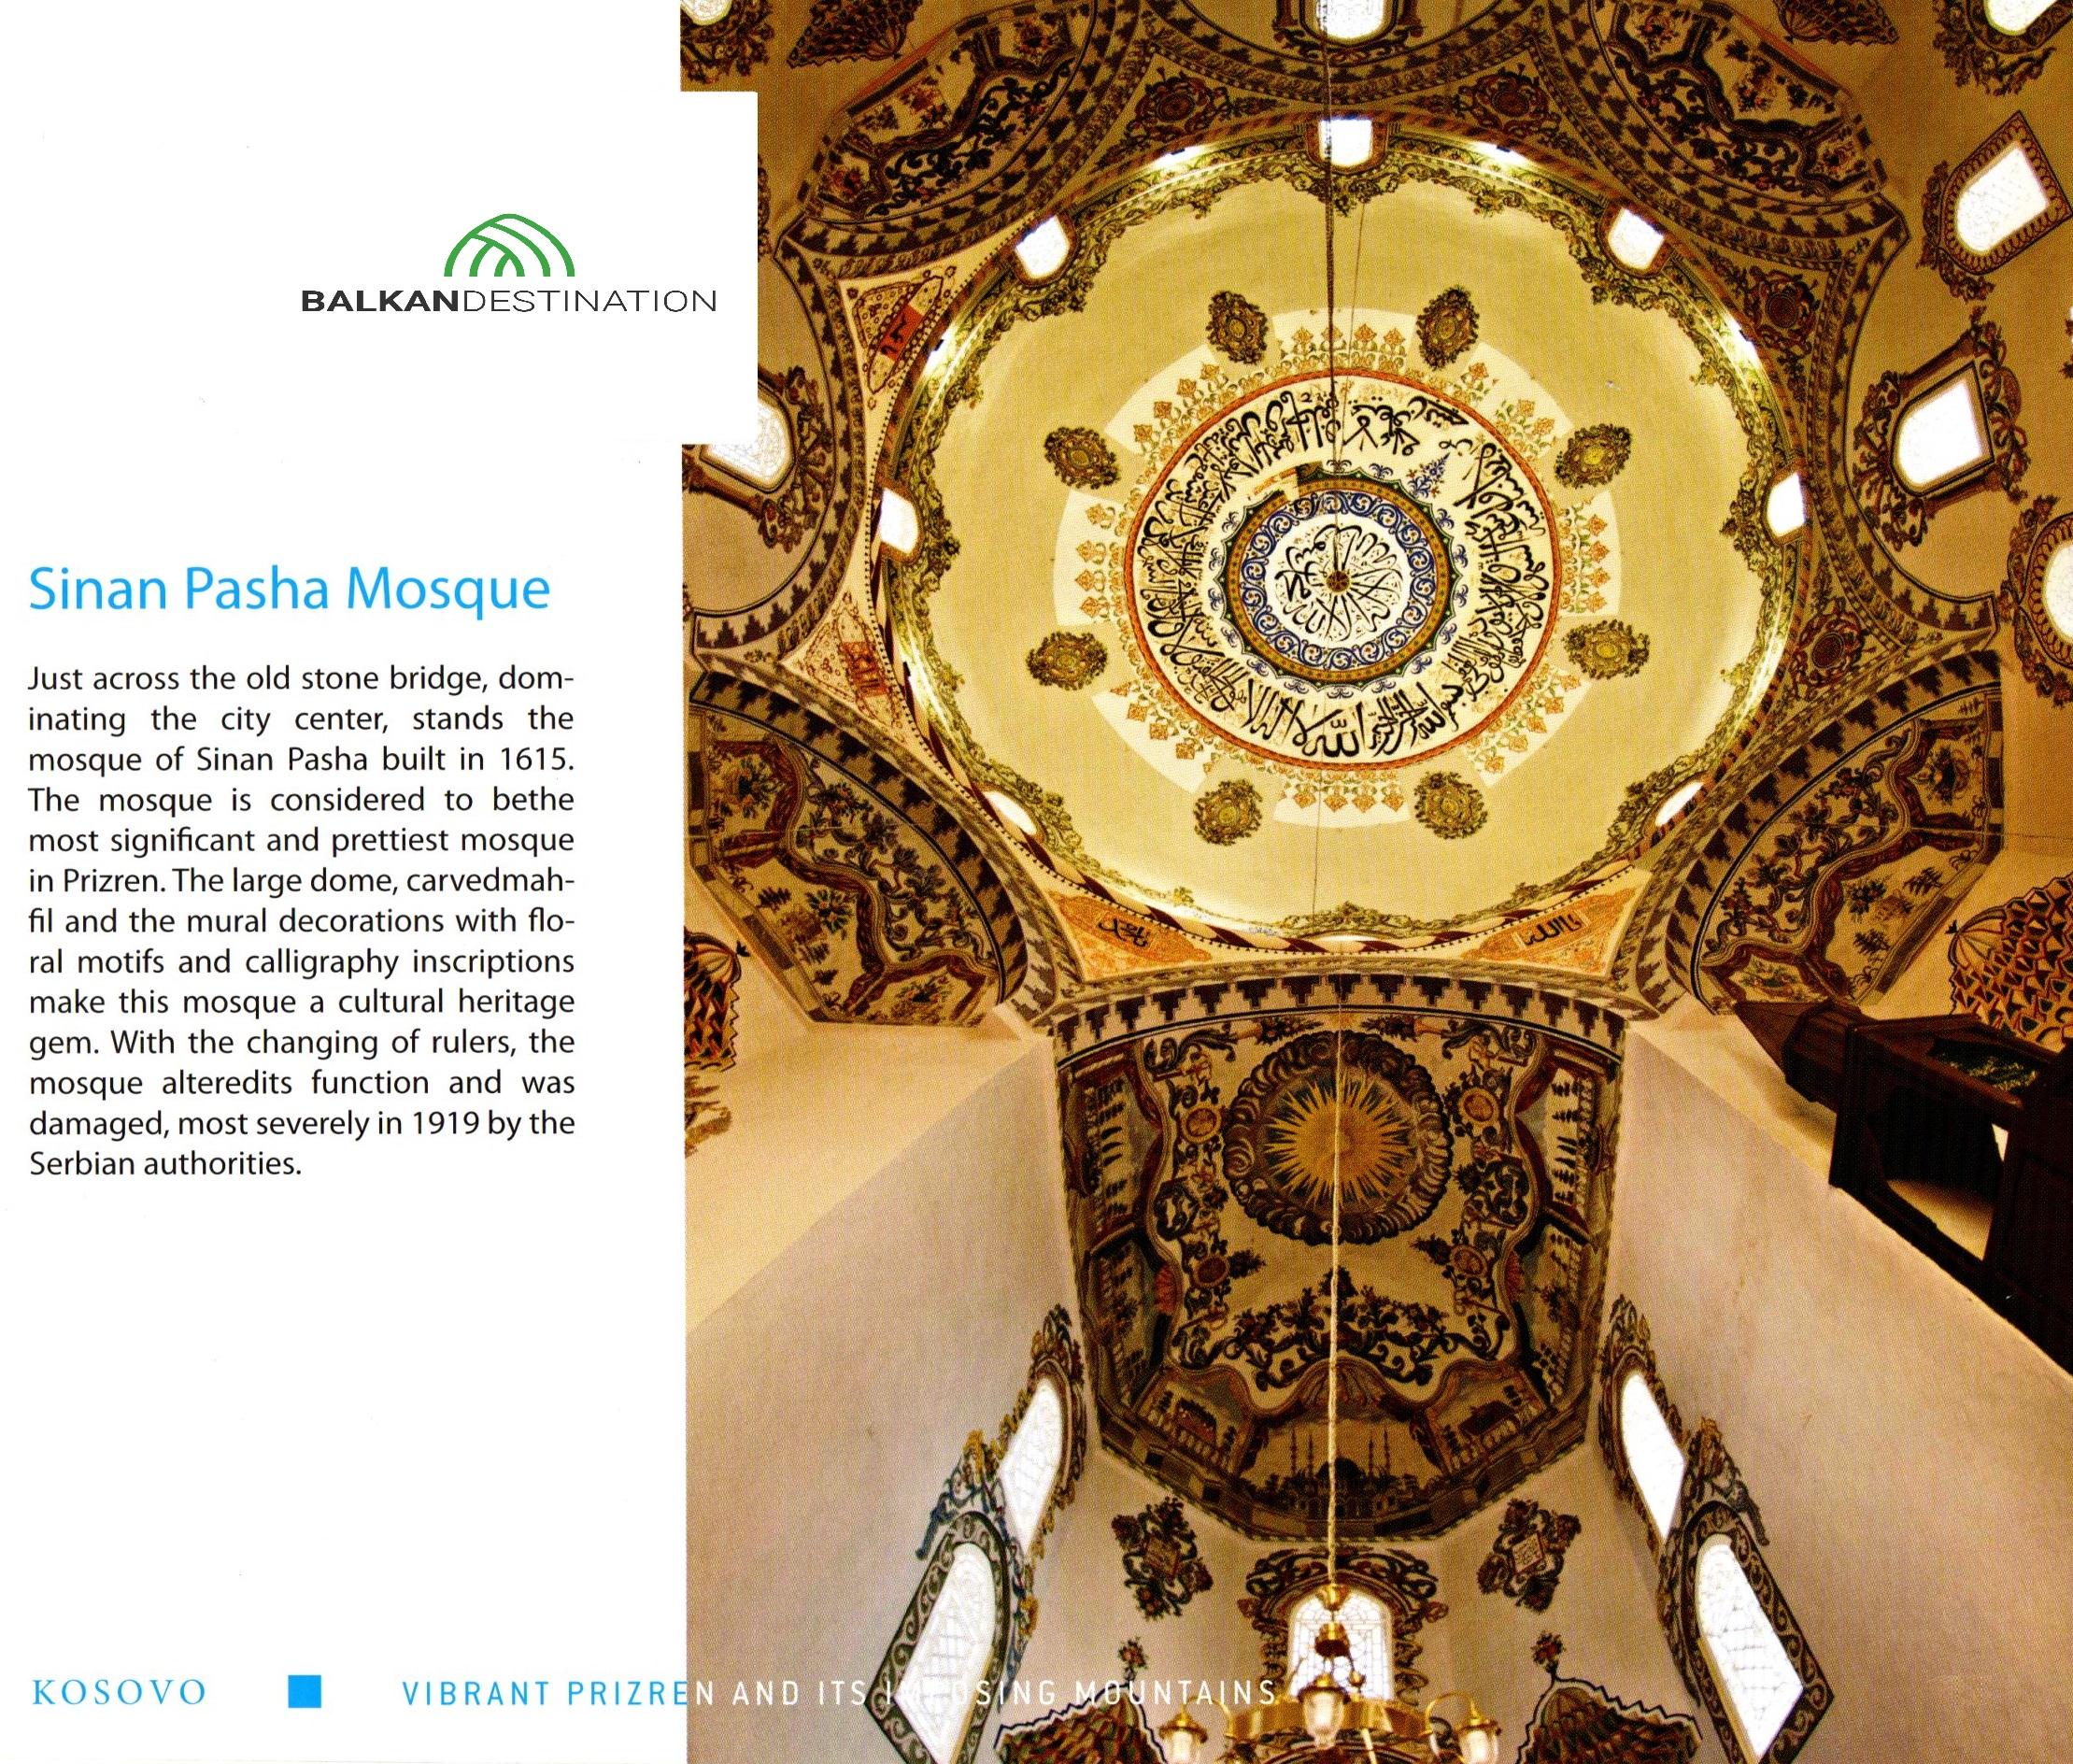 sinanpasha mosque prizren kosovo balkandestination